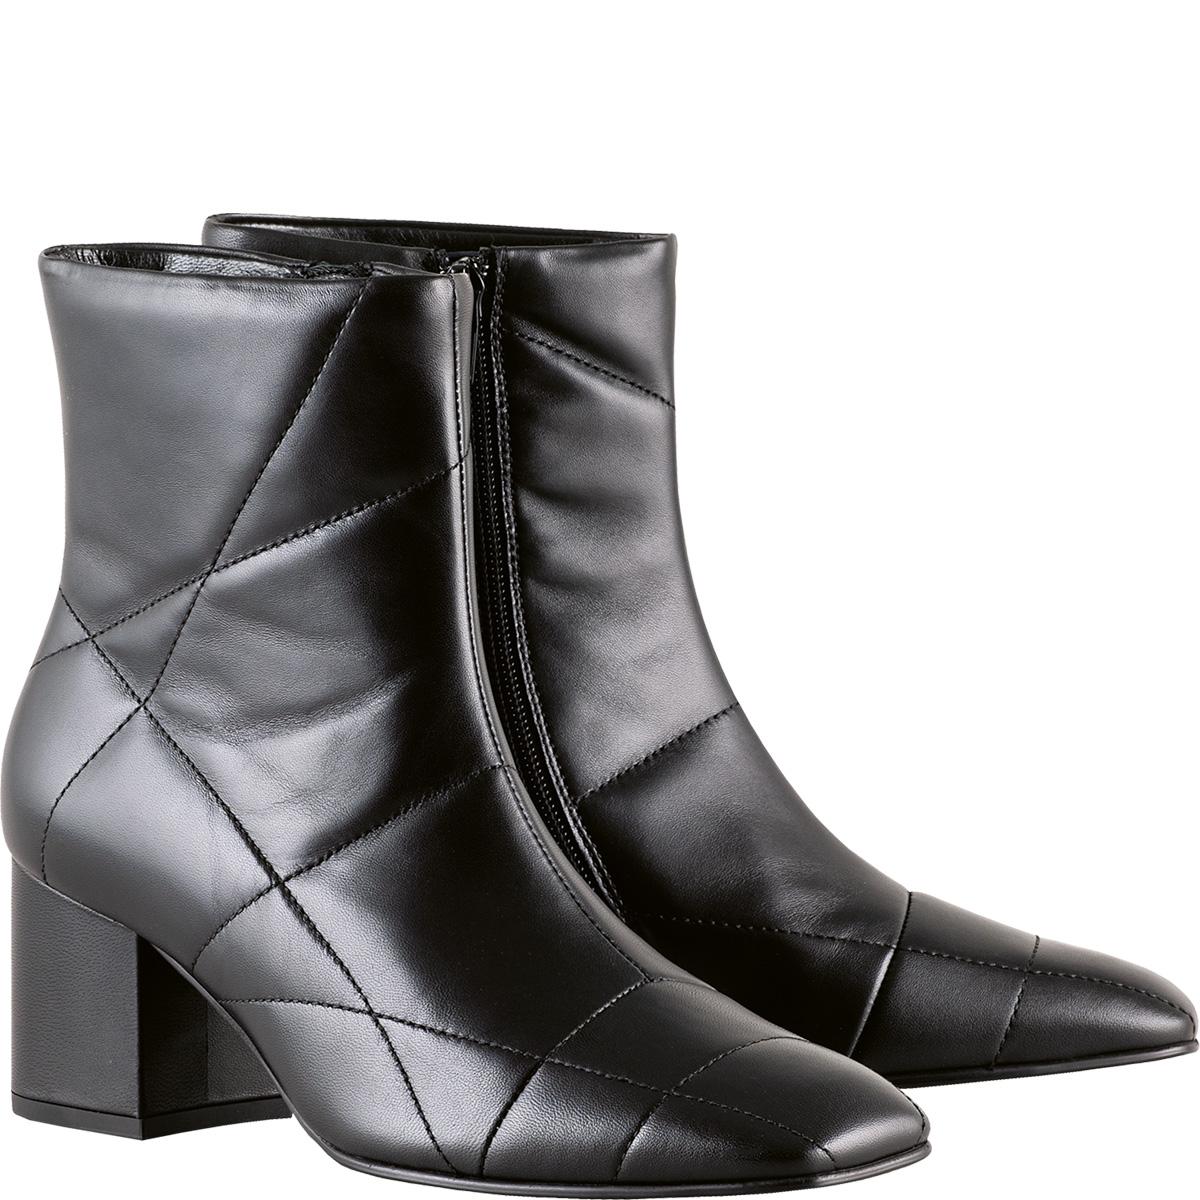 HÖGL Paris støvle, black, 38.5